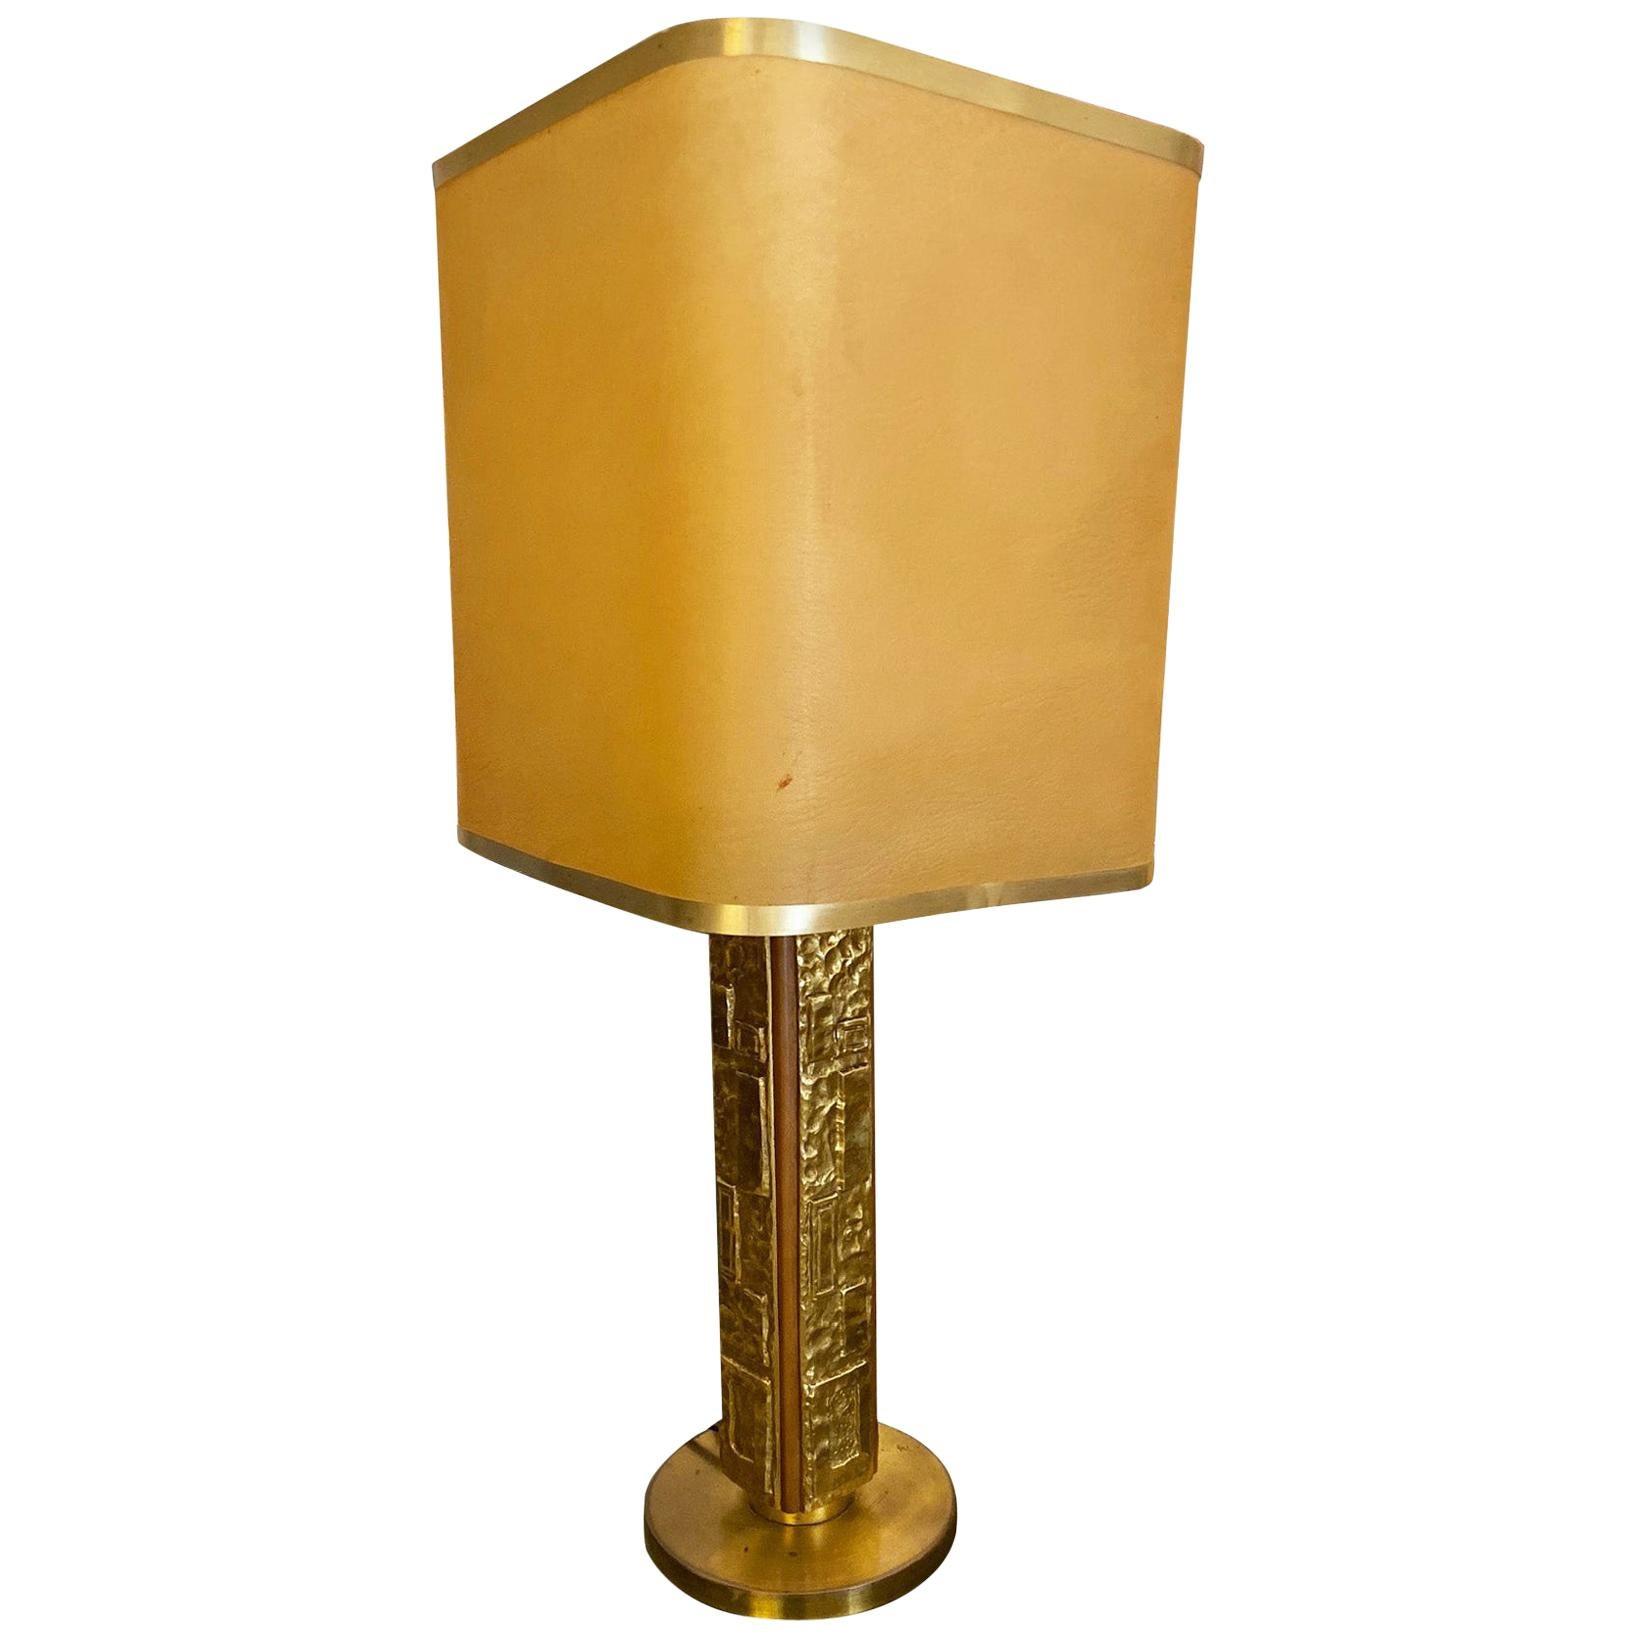 Angelo Brotto for Esperia Brass Table Lamp, Italy, 1970s